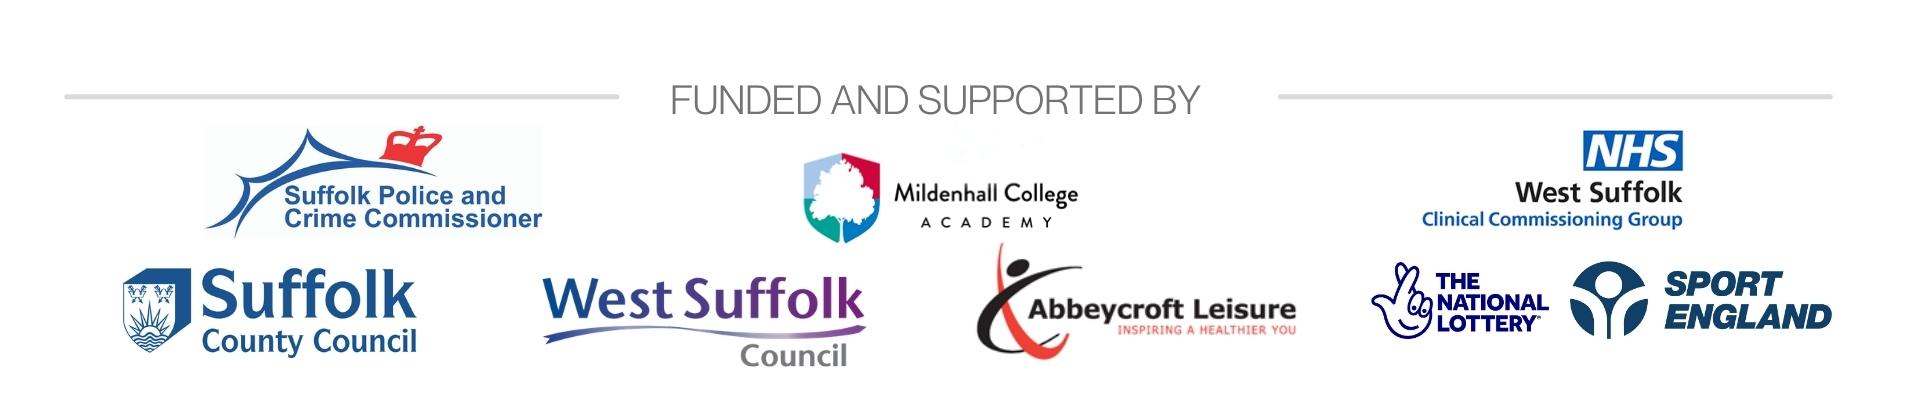 Hub funded partner panel of logos